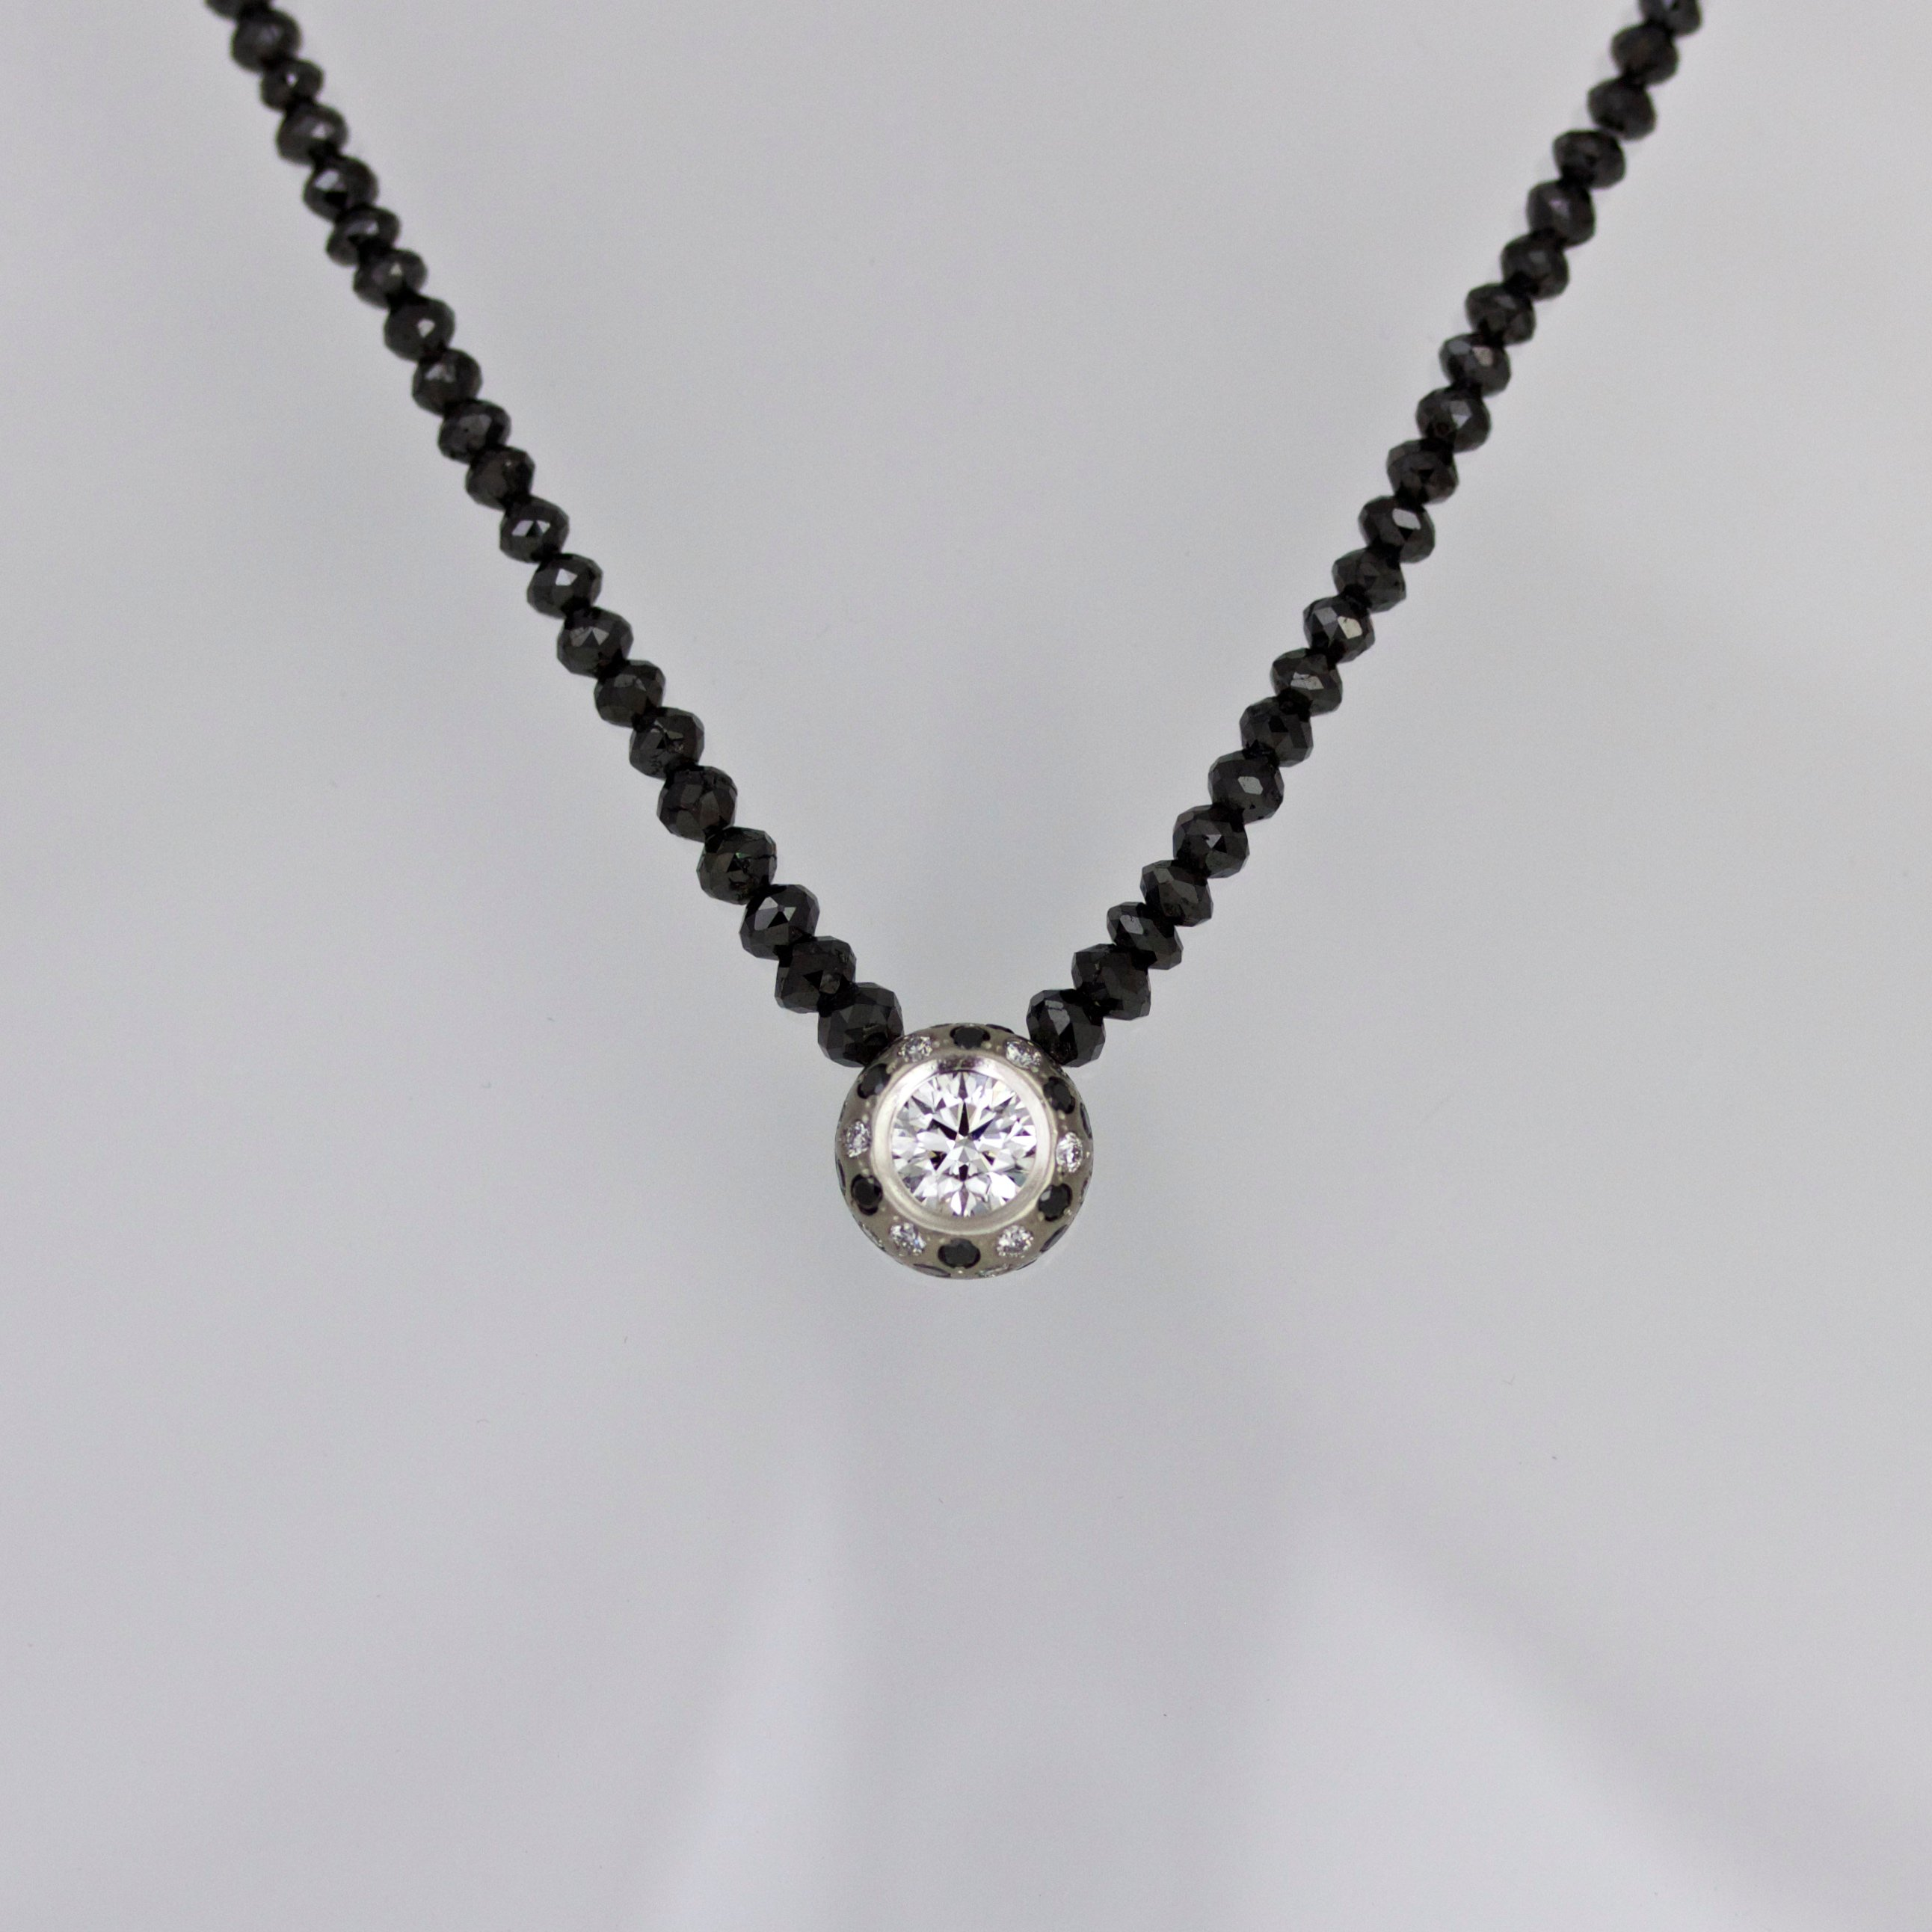 White black diamond necklace handmade in London bepsoke